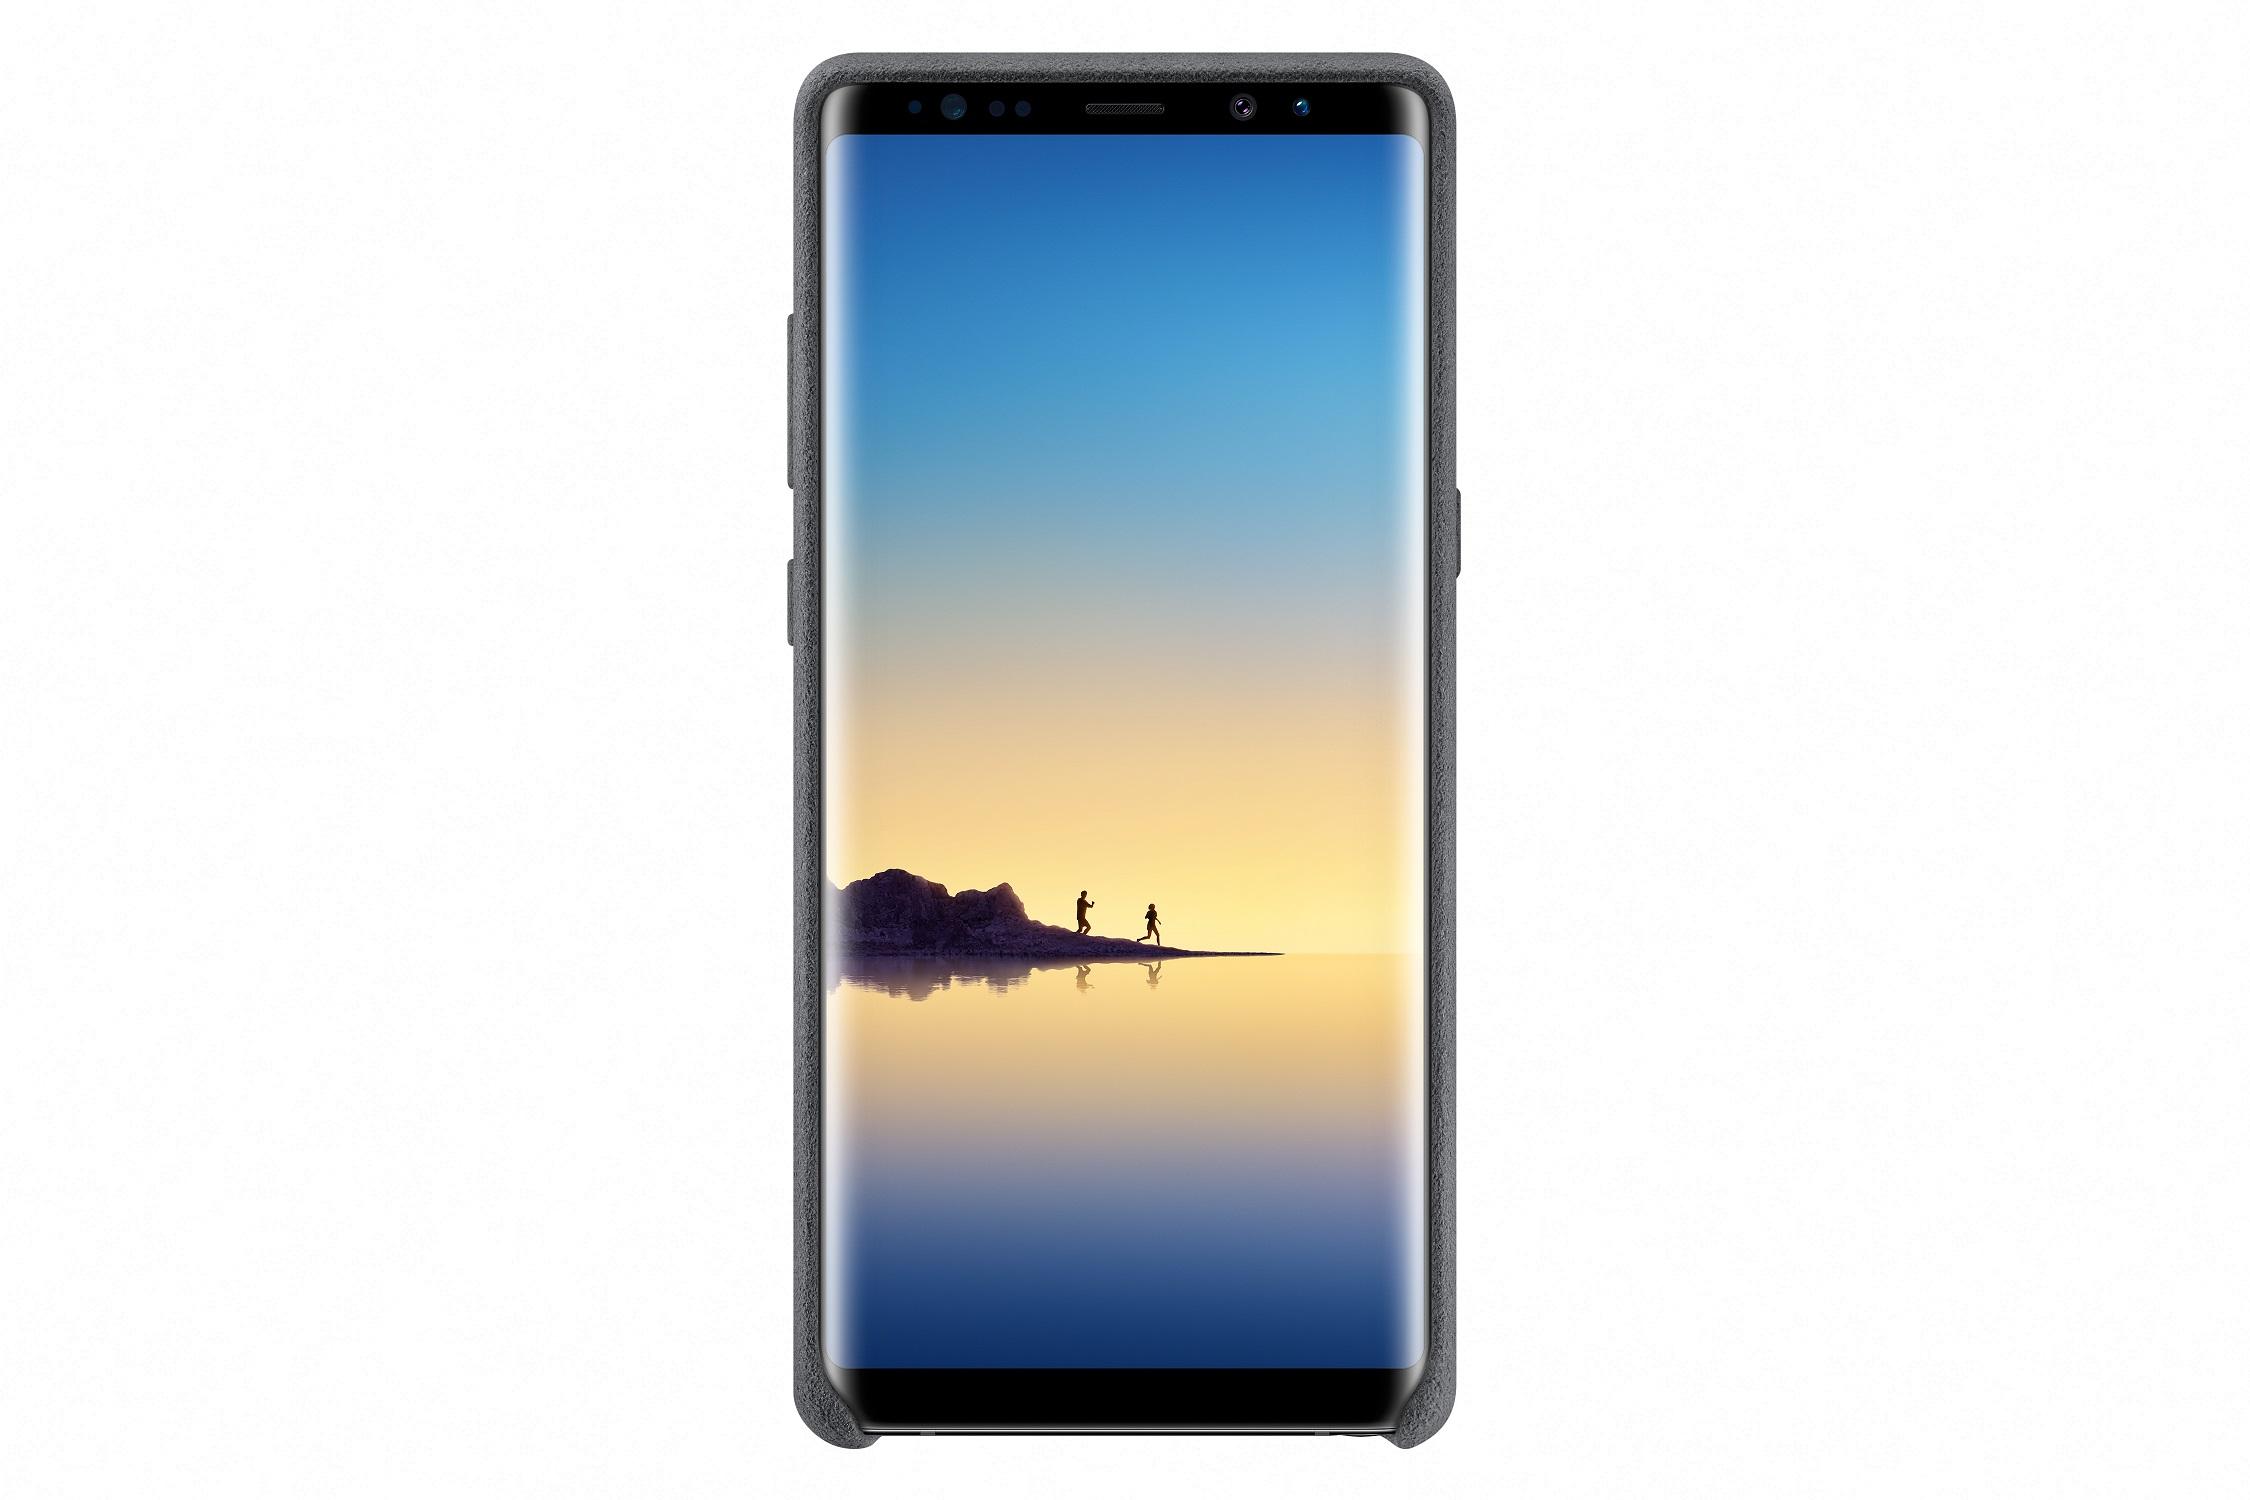 Samsung Alcantara Cover pro NOTE 8 Dark Gray